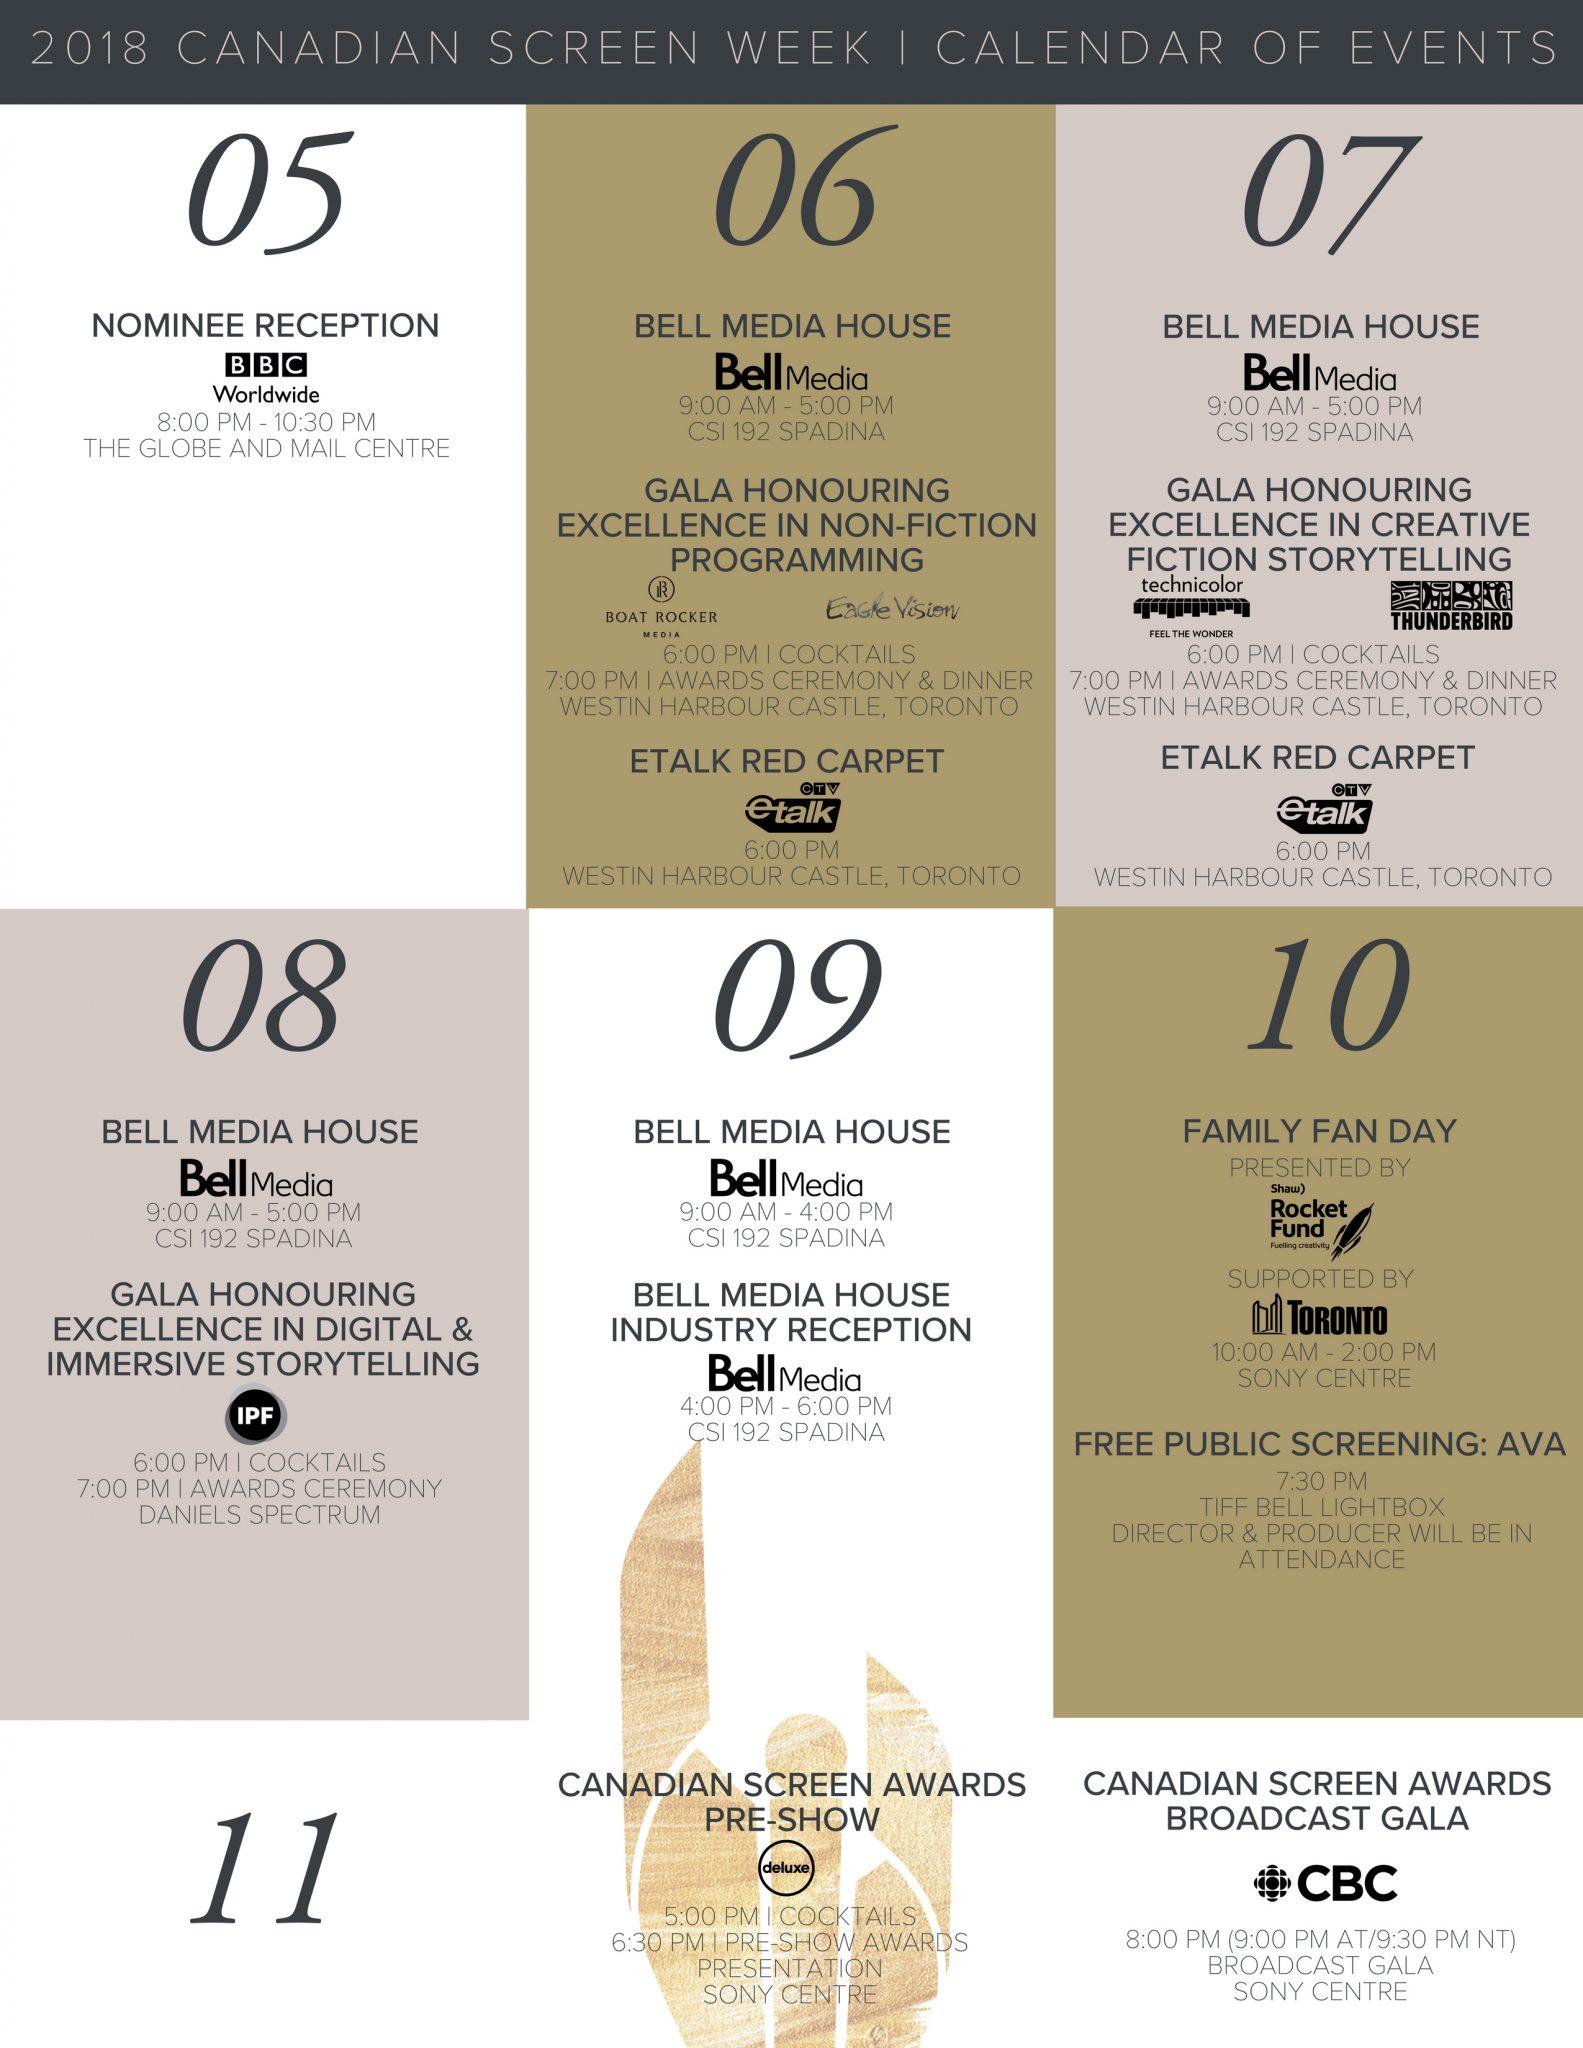 2018 Canadian Screen Week Calendar - Academy ca - Academy ca